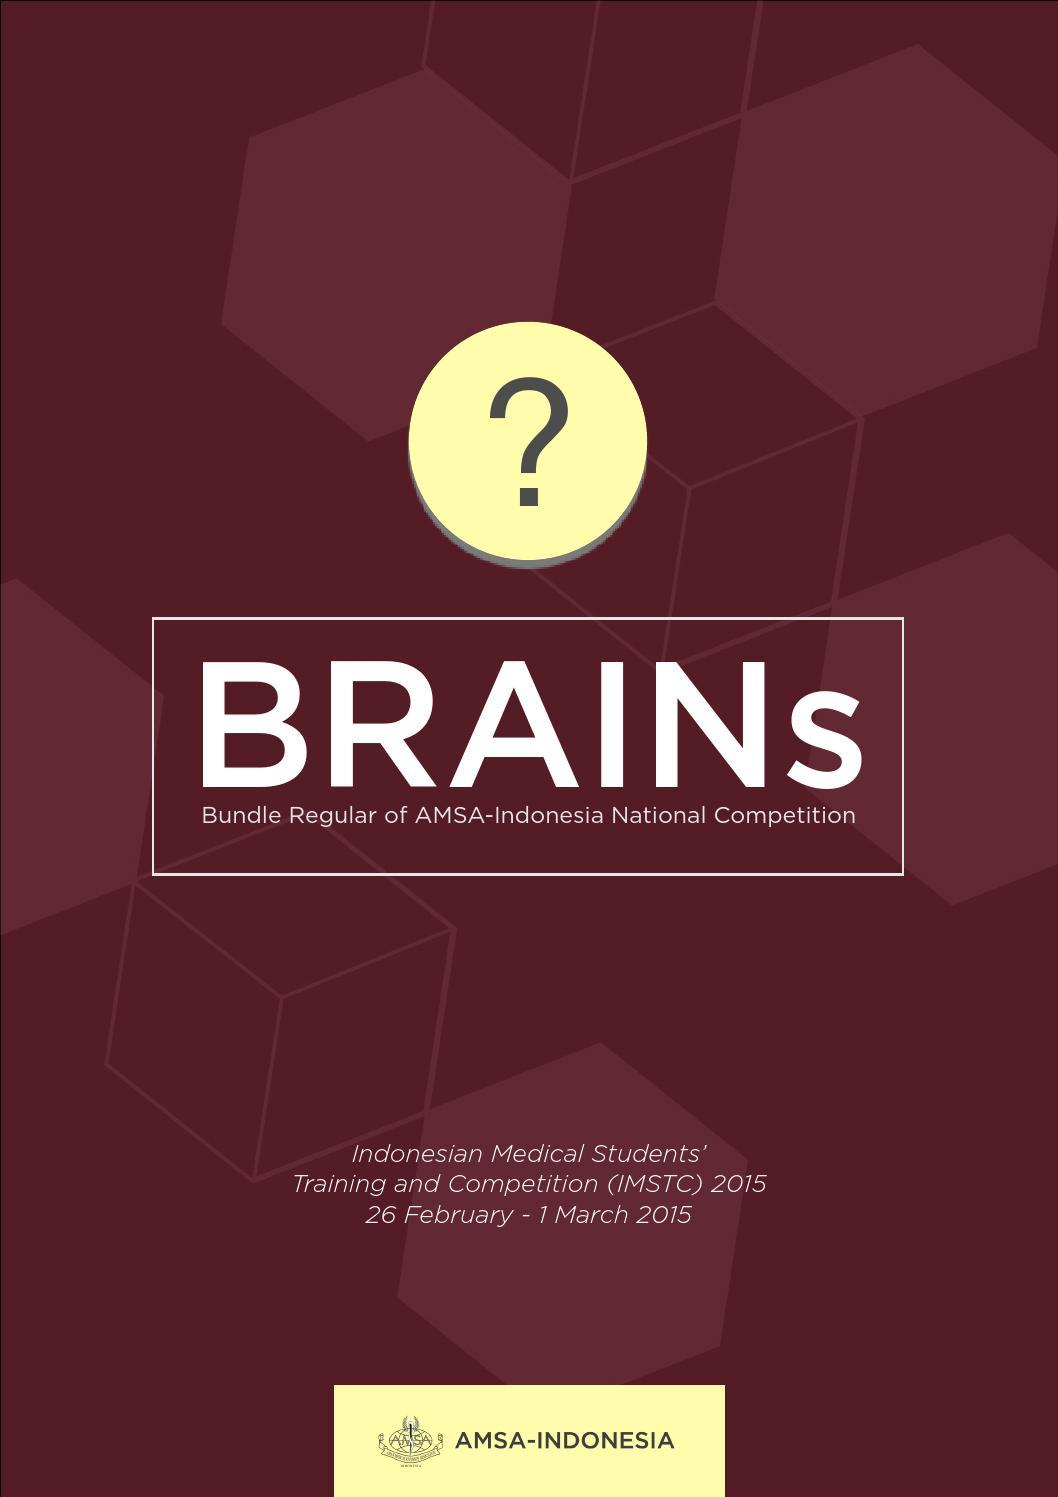 Brains Imstc 2015 By Amsa Indonesia Issuu Filter Rokok Permanen Japan Standard Stick Mg